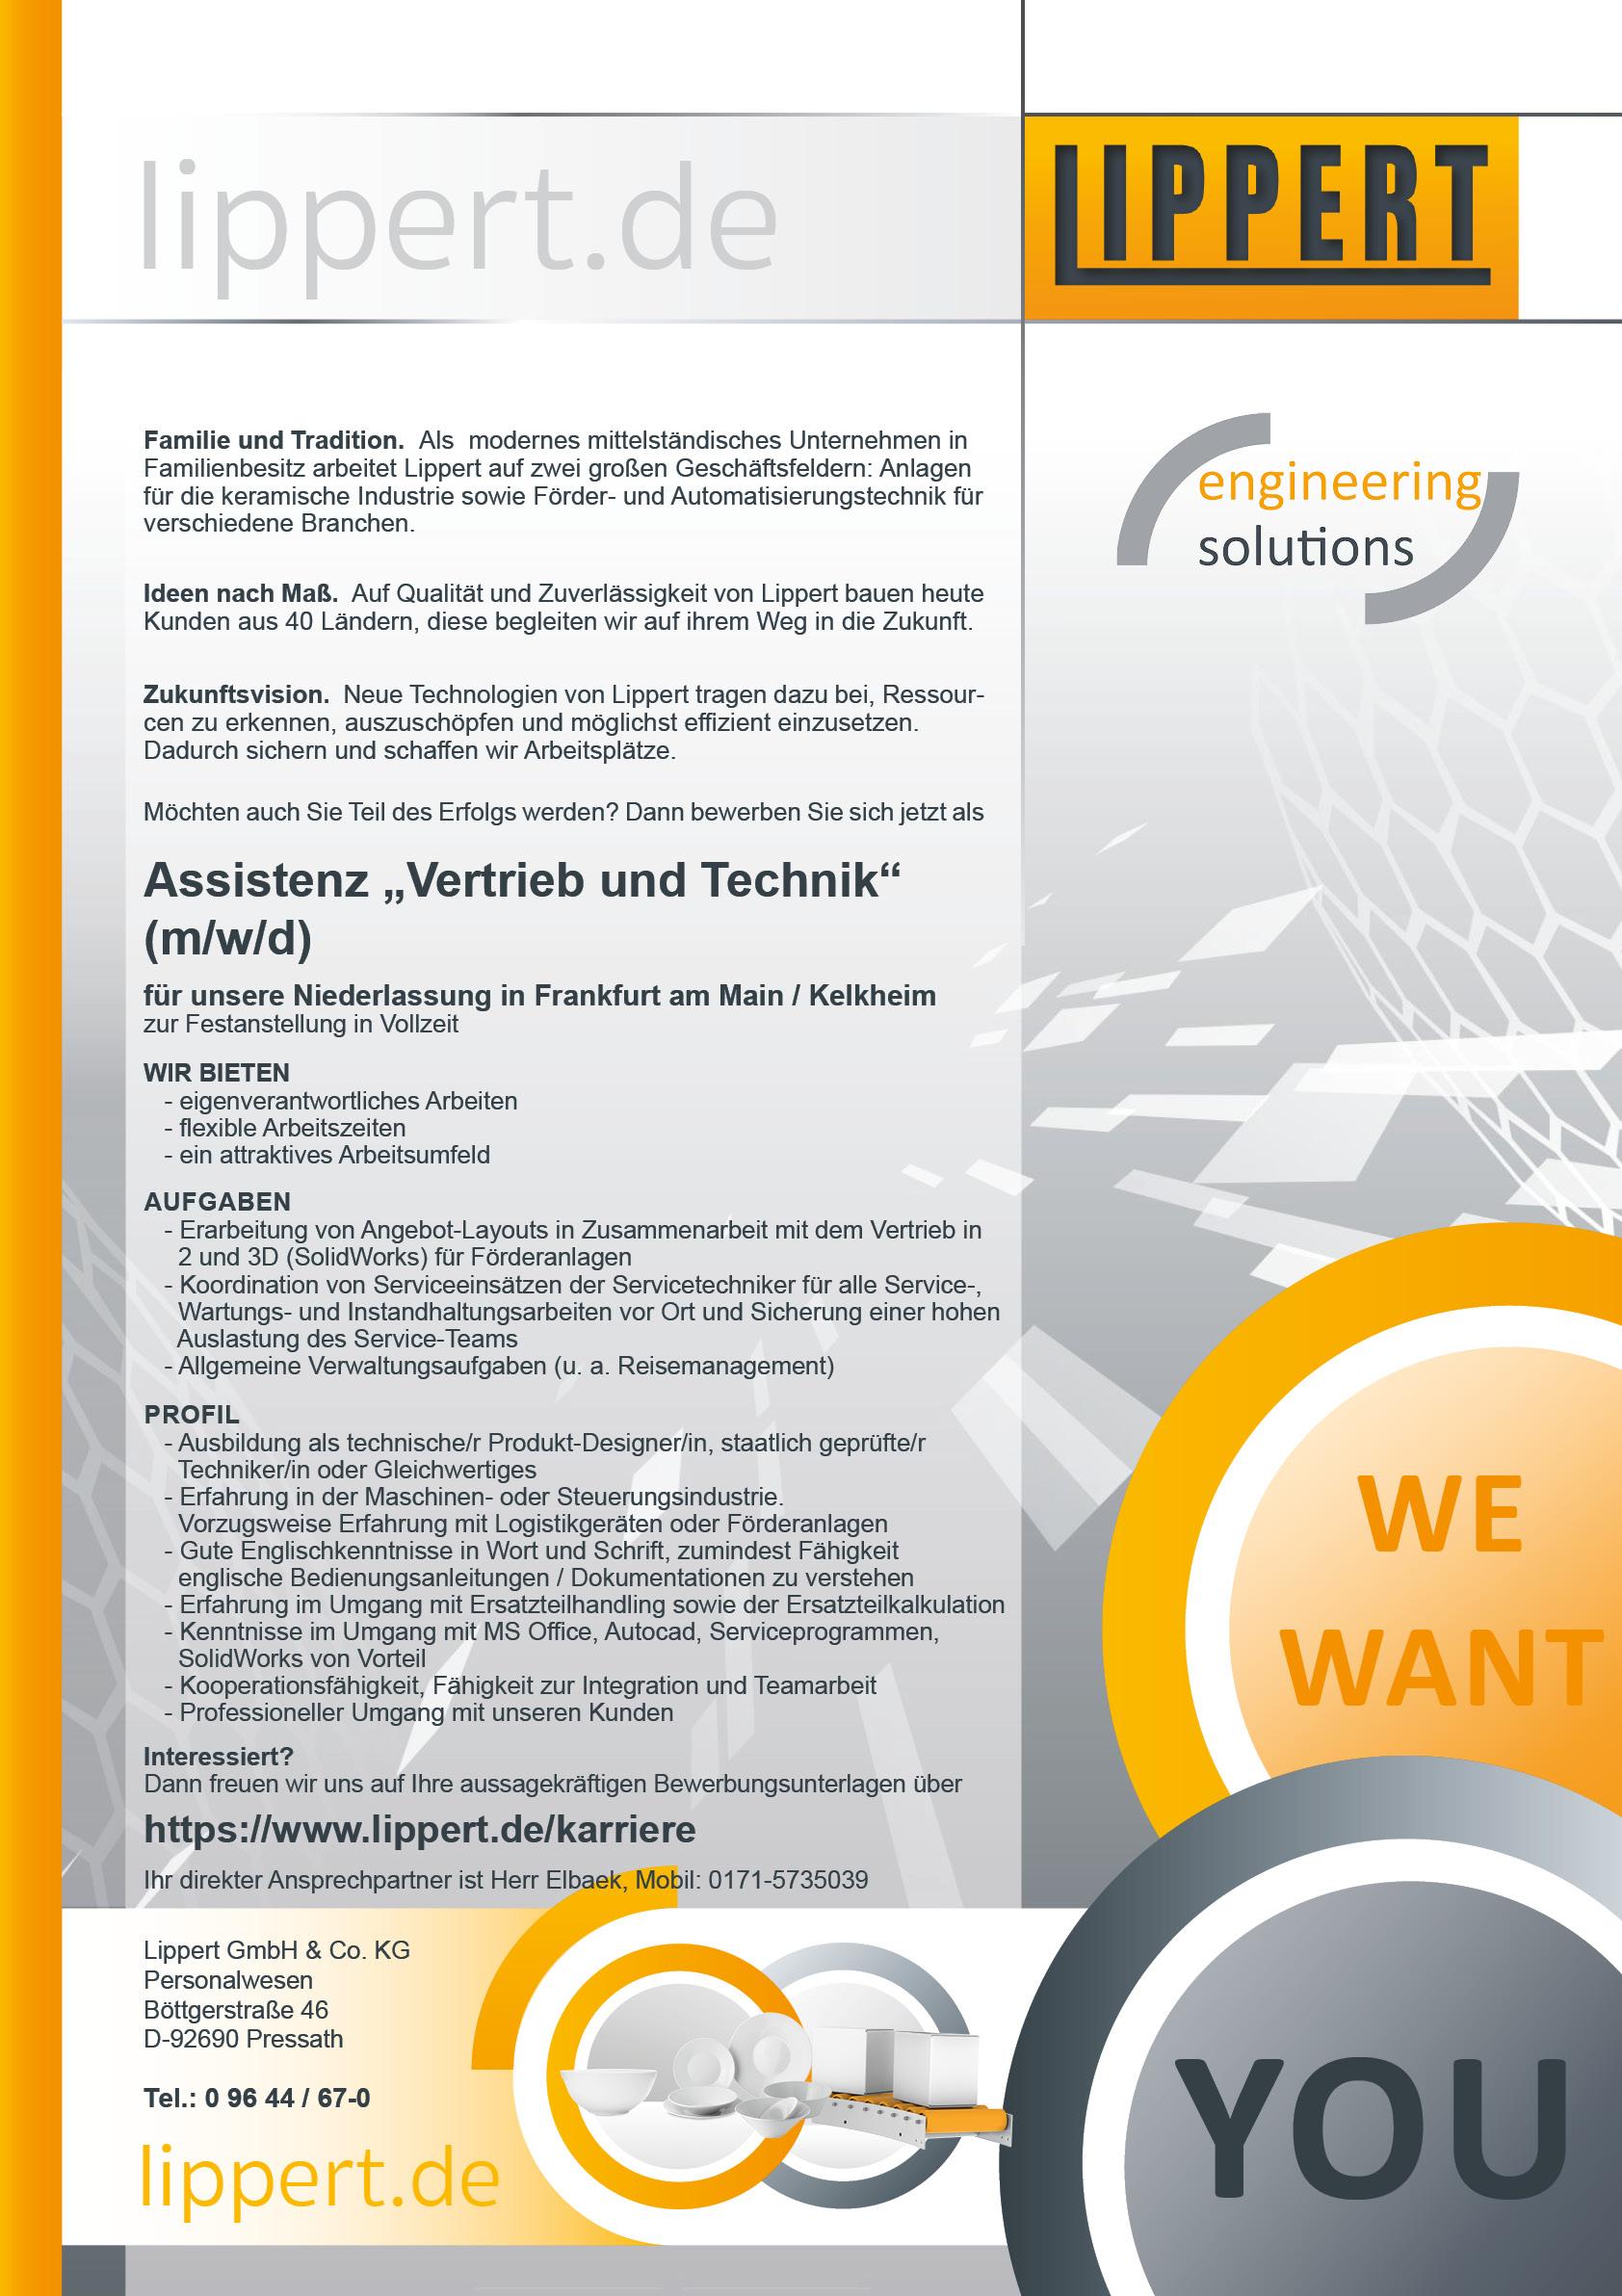 Assistenz Vertrieb und Technik (m/w/d)